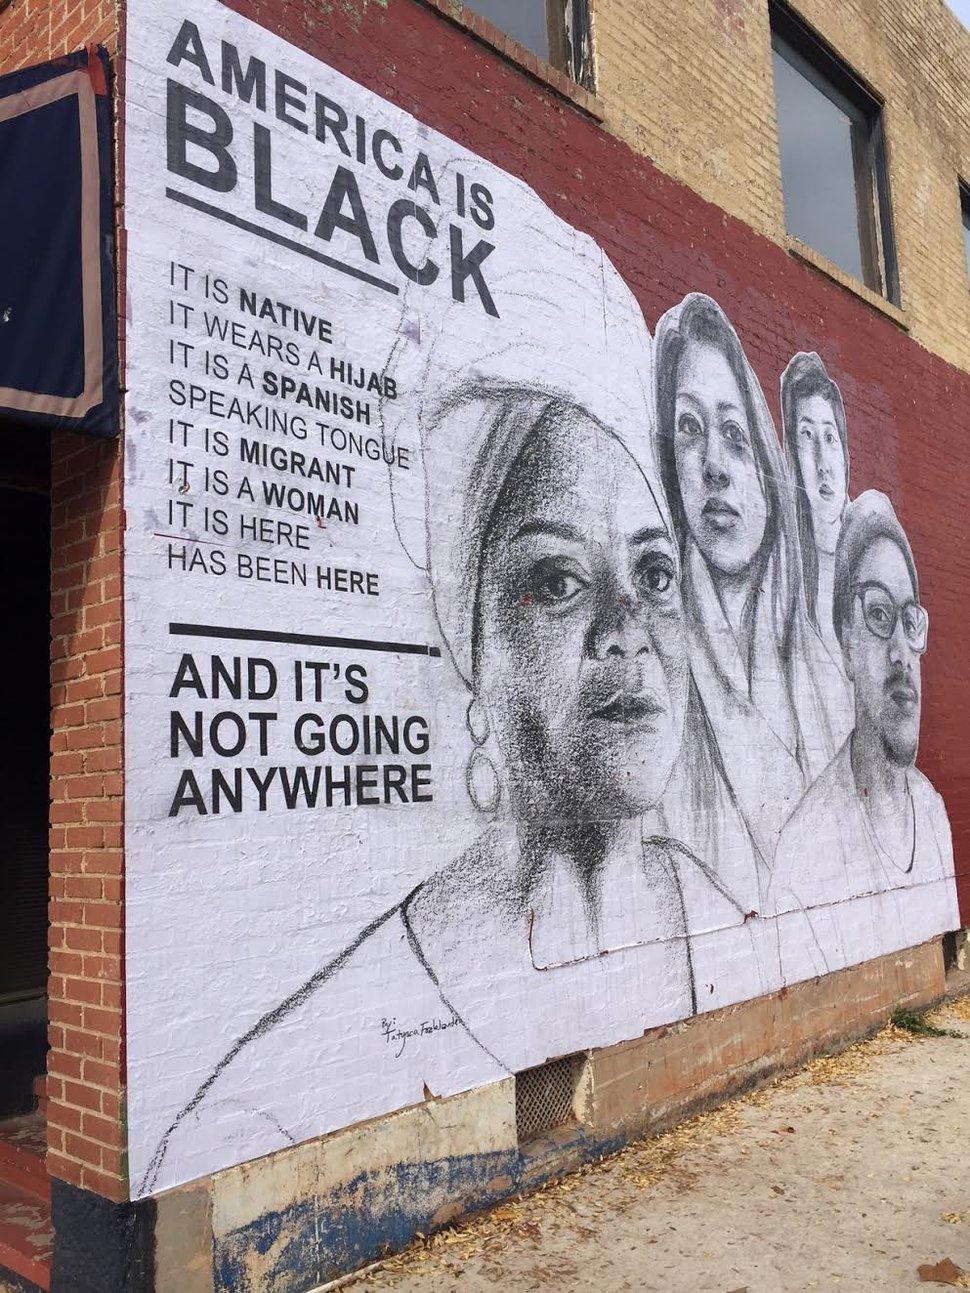 tatyana-fazlalizadeh-mural